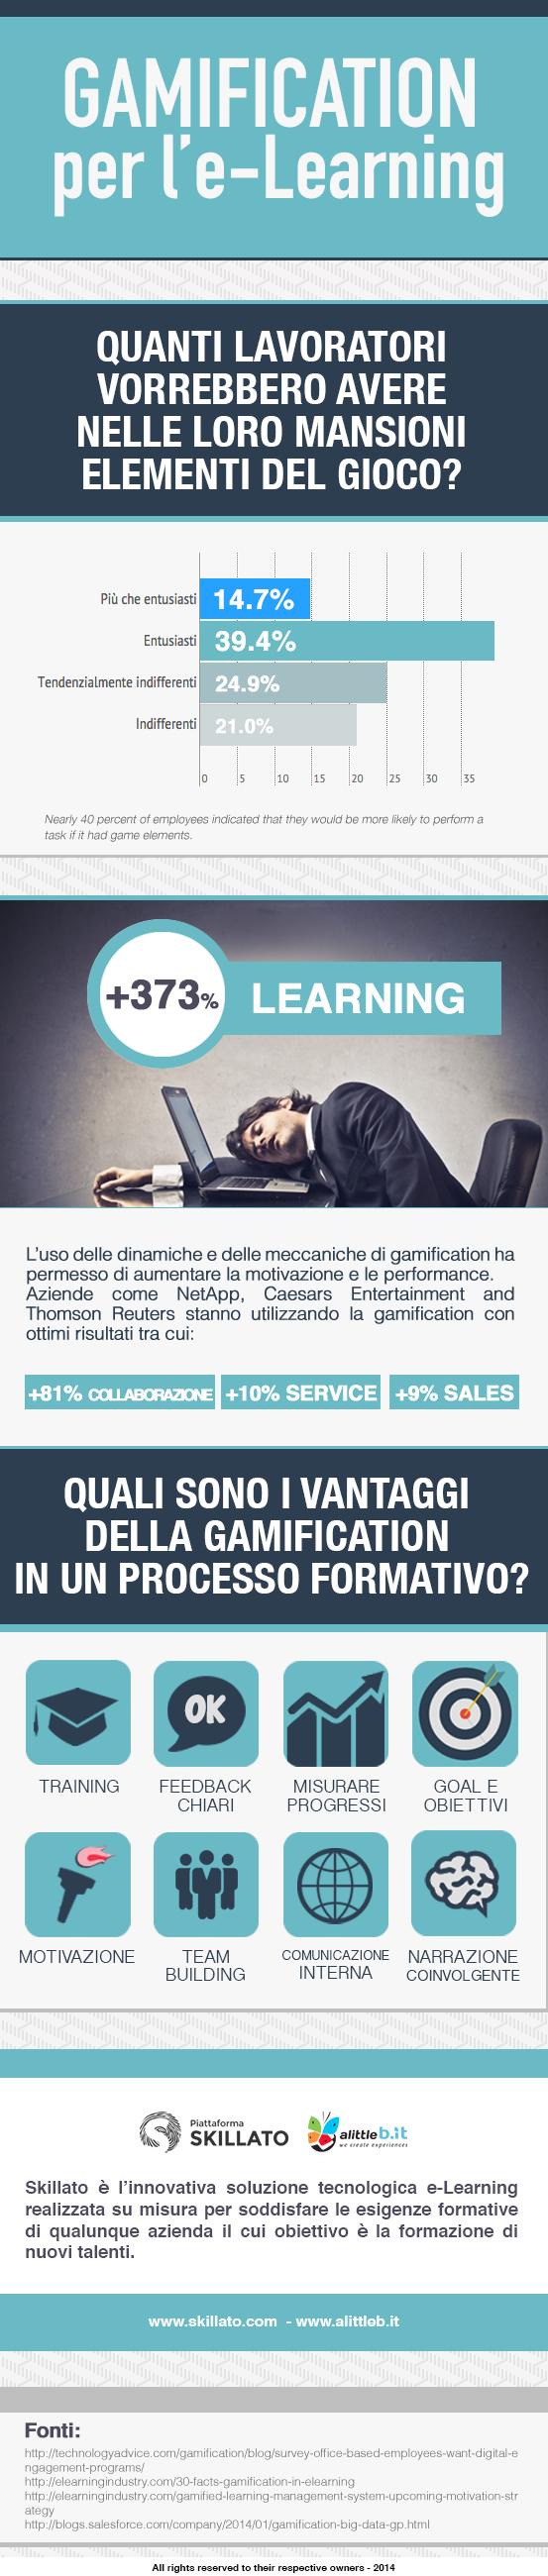 Skillato-gamification-e-learning-infografica